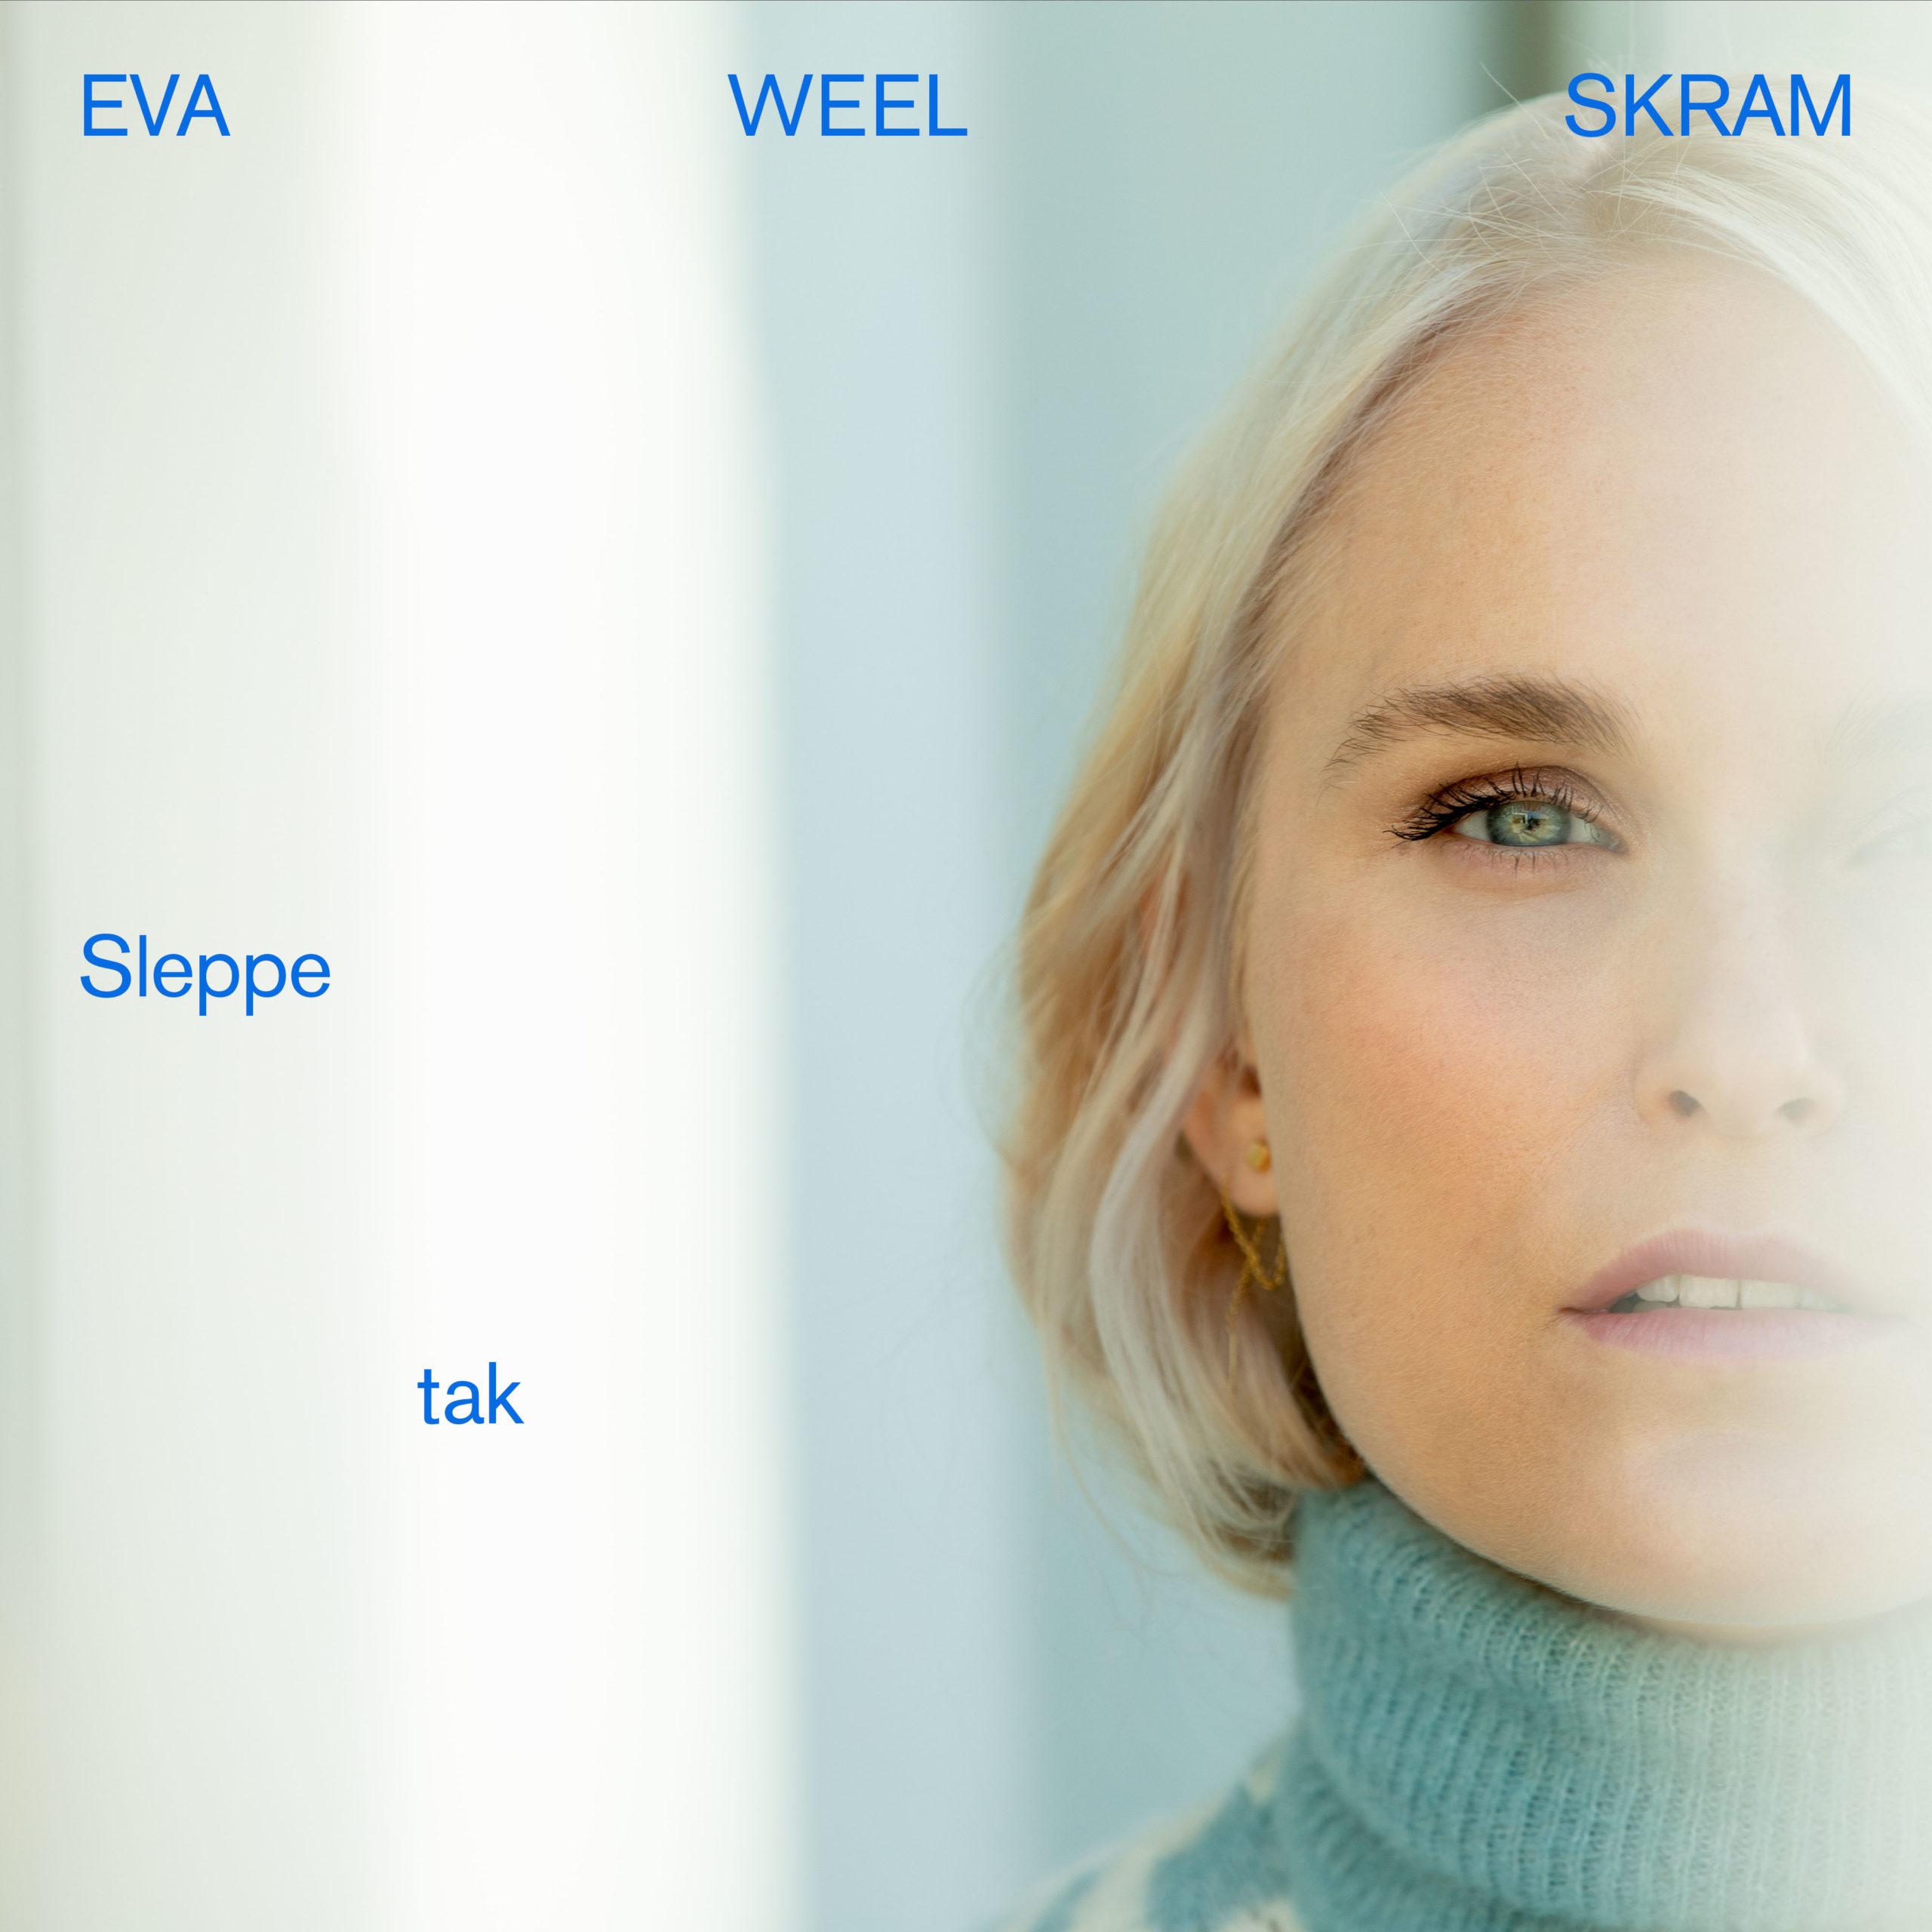 Eva Weel Skram - Sleppe tak